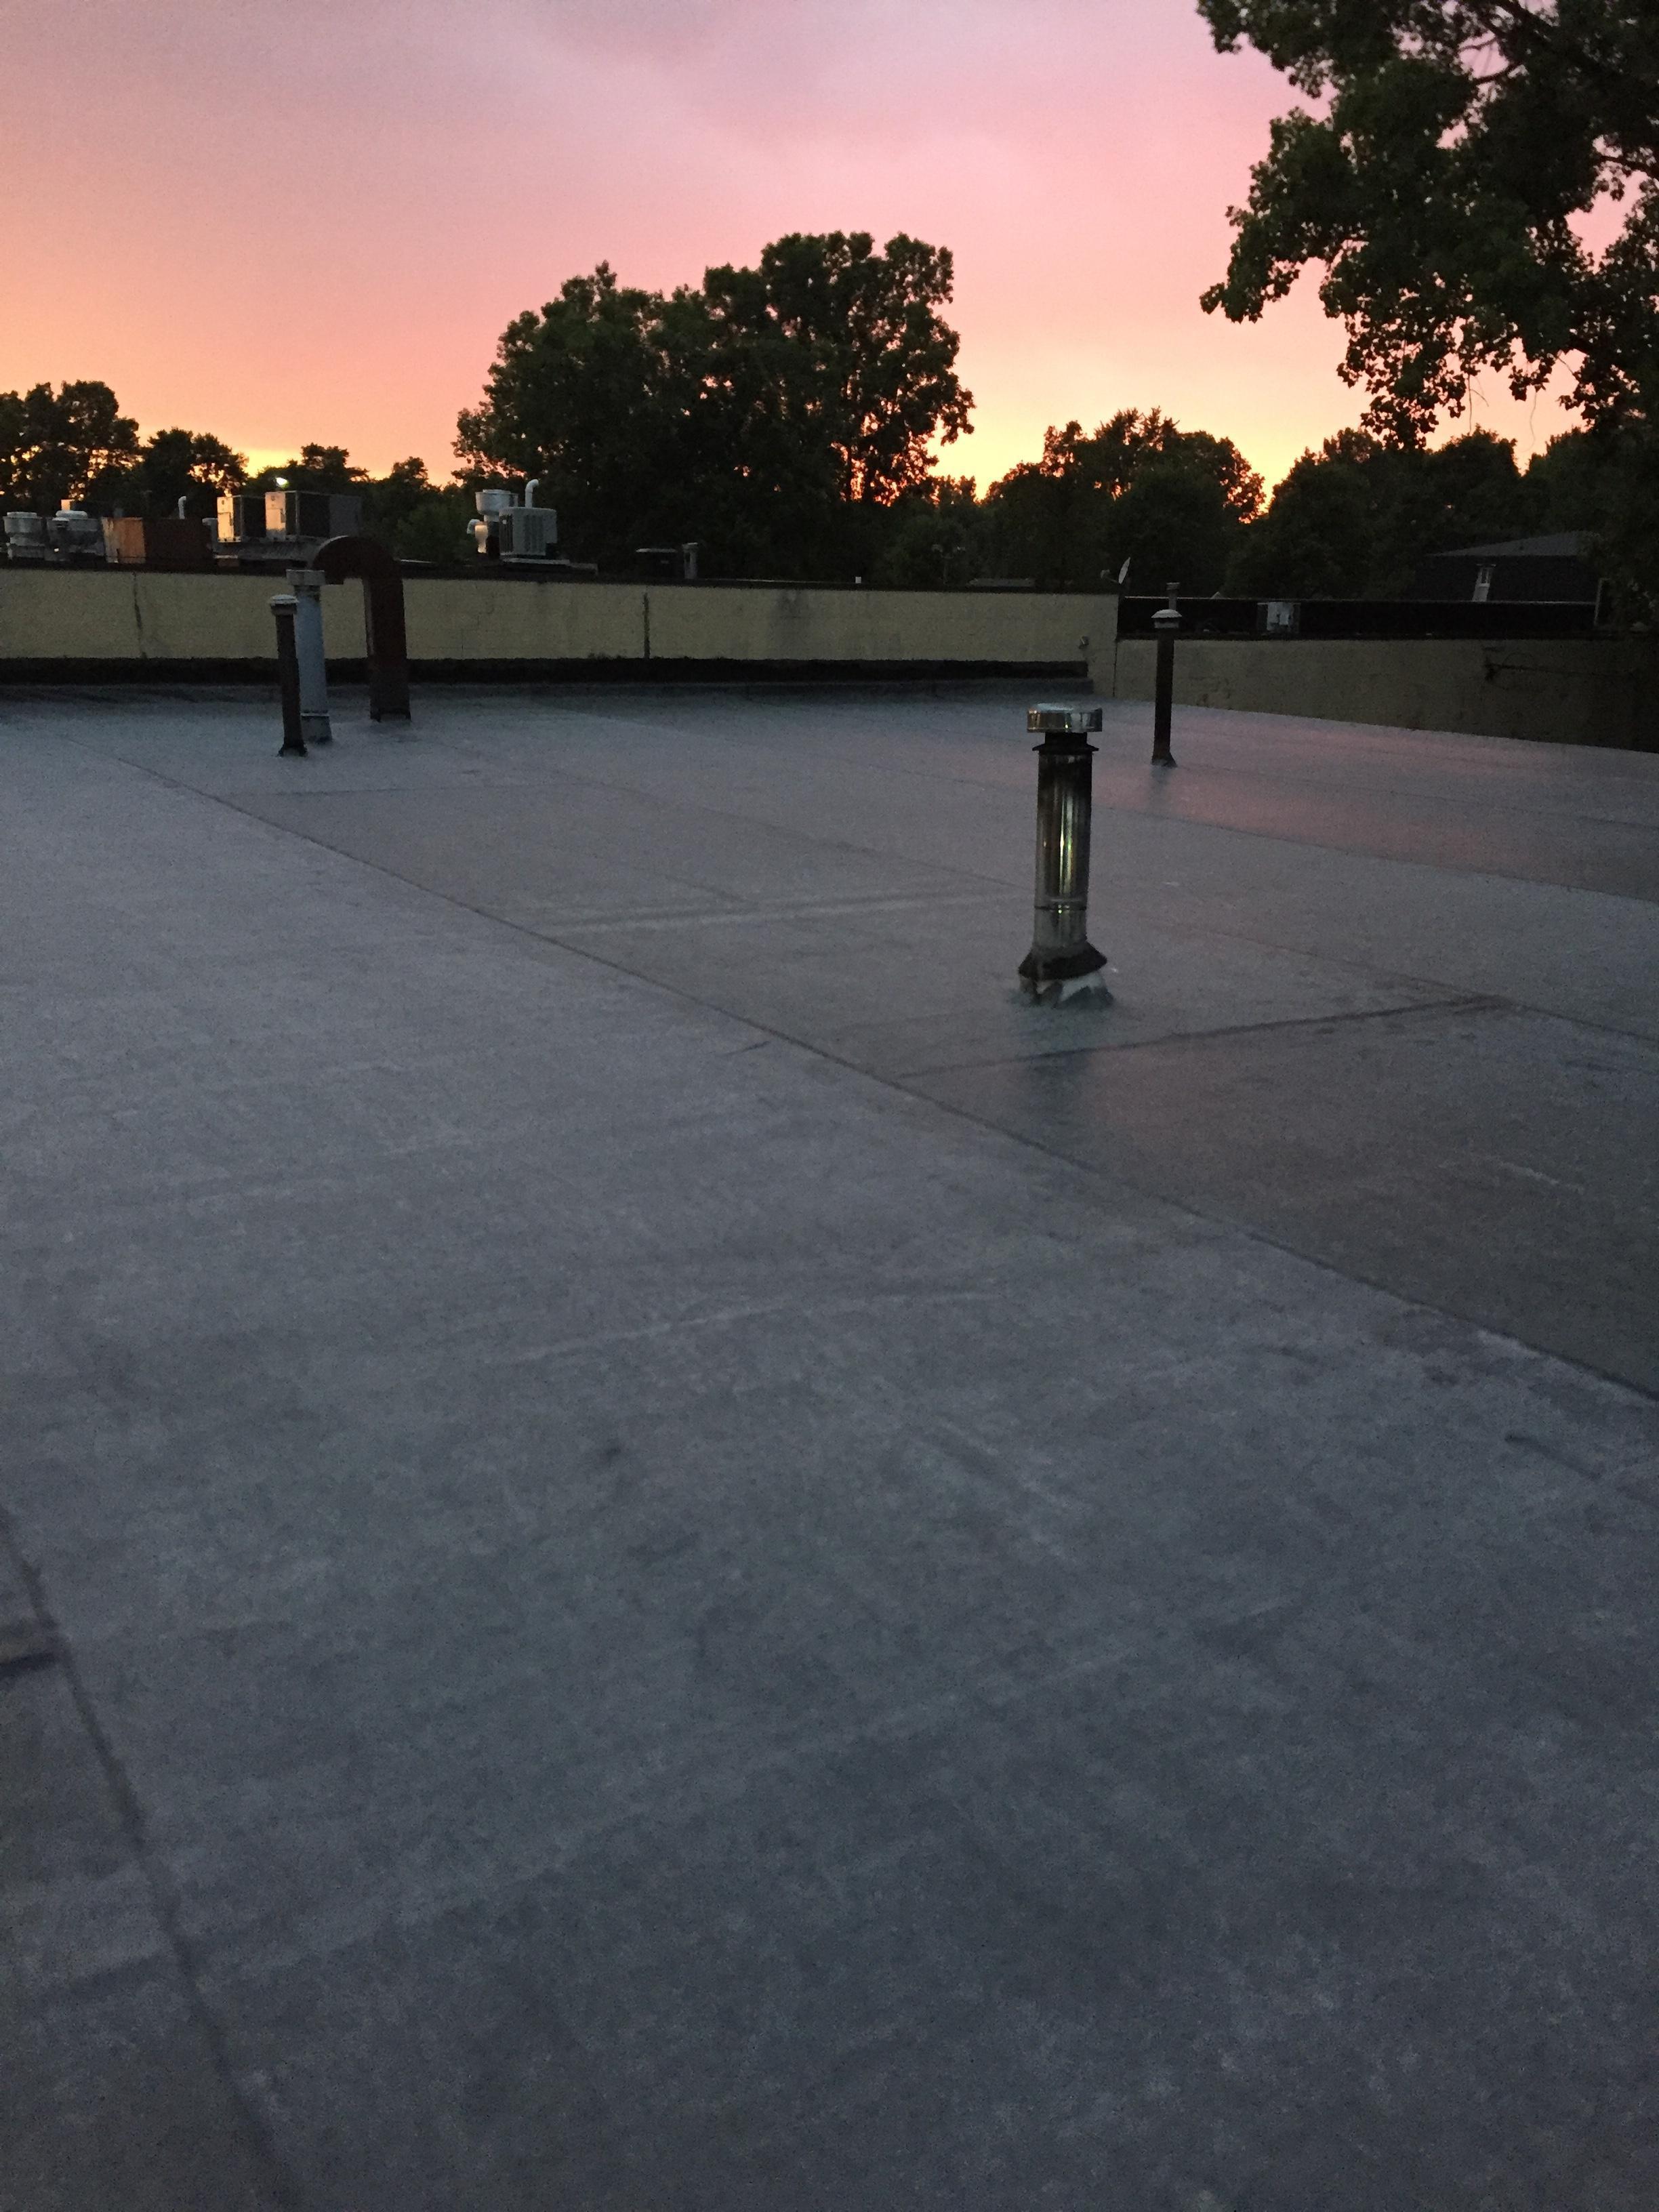 Advanced roofing in cherry hill nj 08002 for Garage door repair cherry hill nj